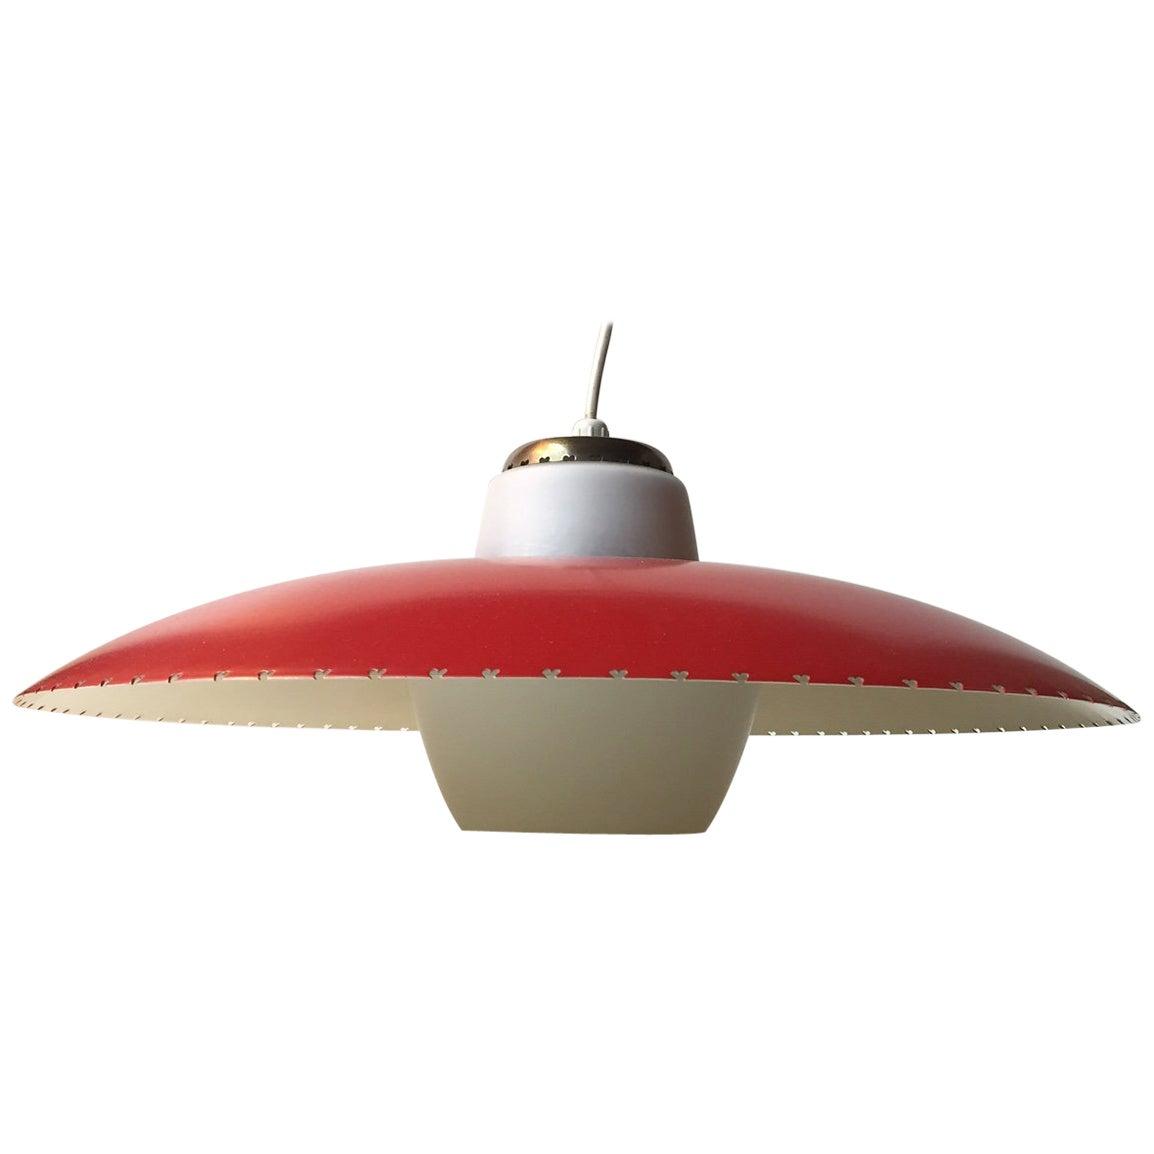 Danish Midcentury 'Heart' Pendant Lamp by Bent Karlby for Lyfa, 1950s